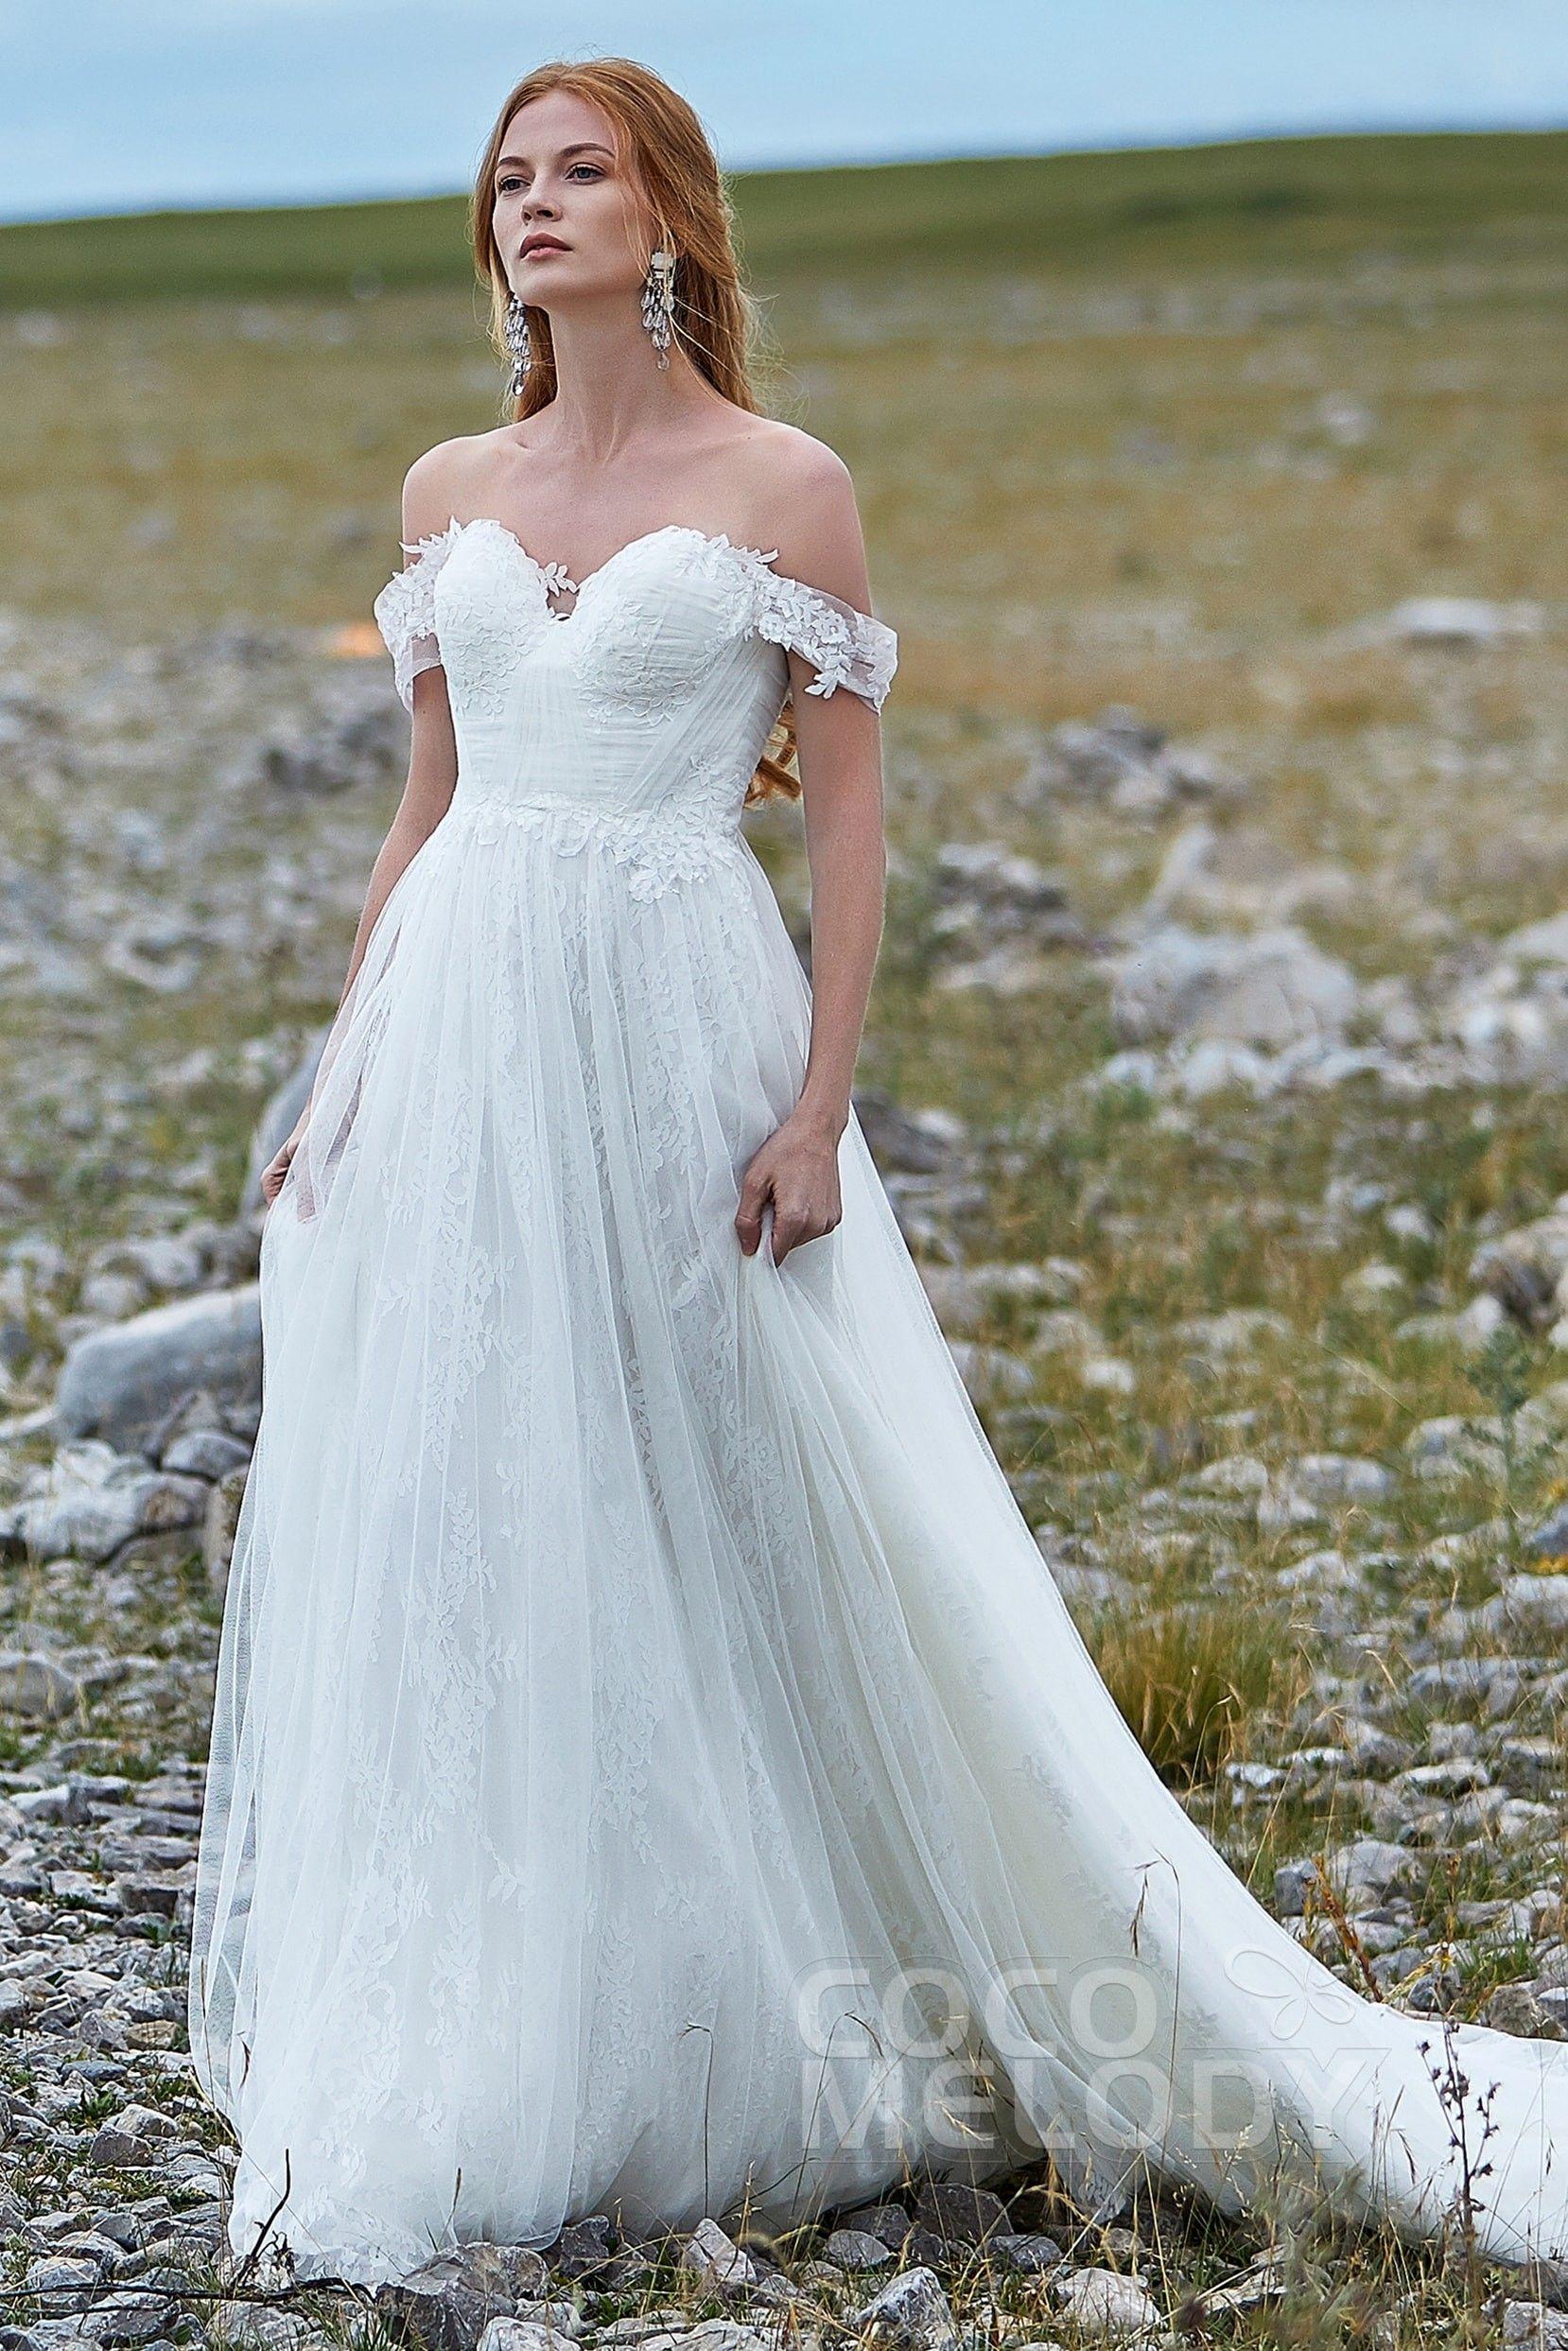 24+ Types of weddings dresses information